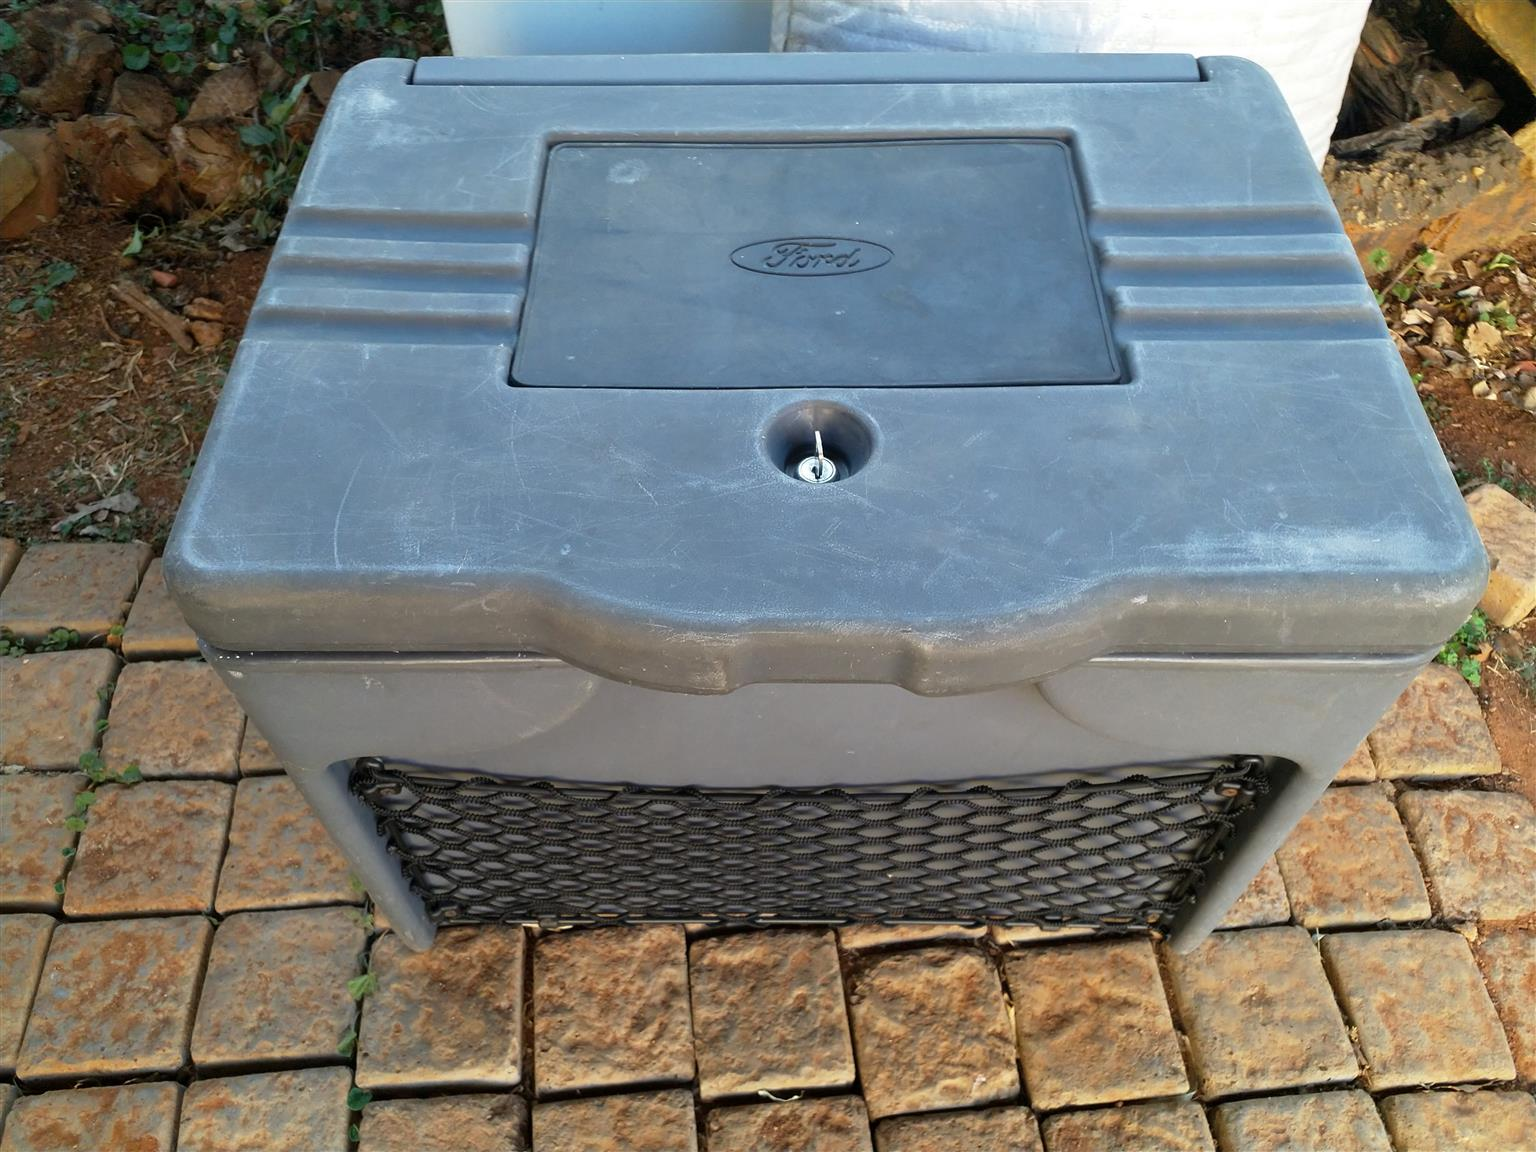 Ford Ranger Utility boxes